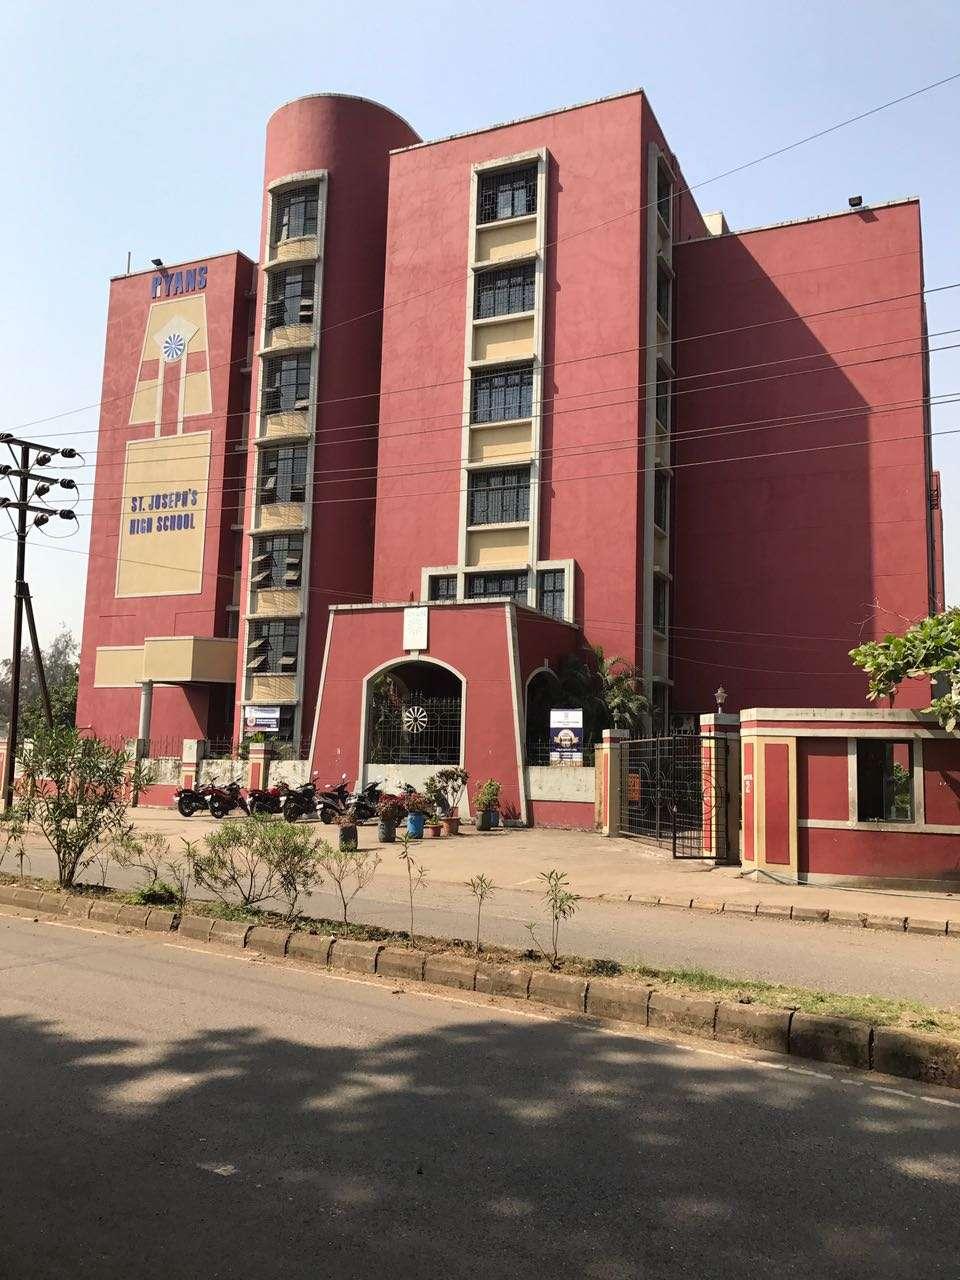 ST JOSEPH HIGH SCHOOL PLOT NO 8 SECTOR 7 NEW PANVEL NAVI MUMBAI DISTT RAIGAD MAHARSHTRA 1130094